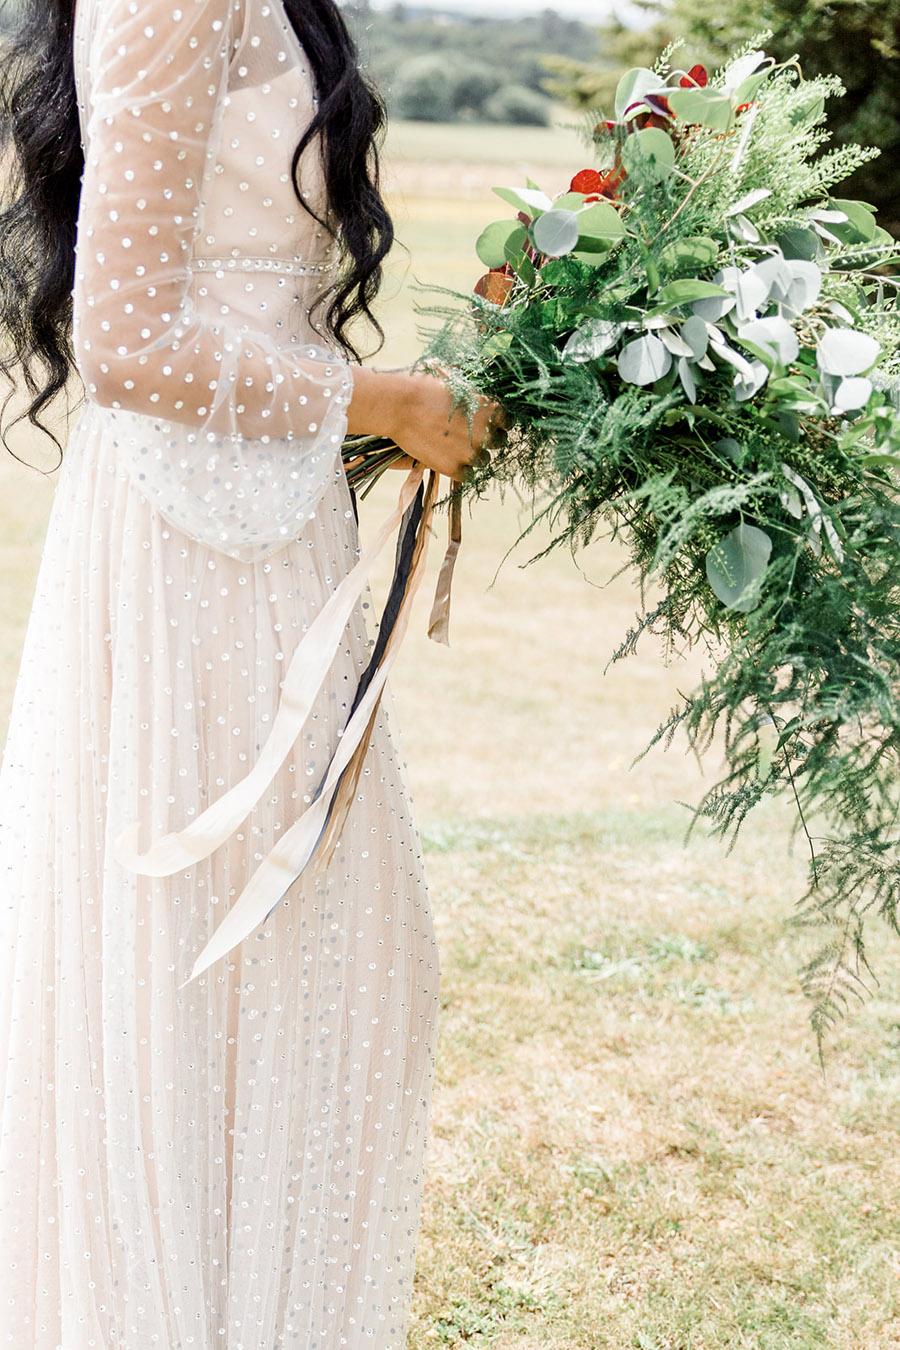 Modern Boho wedding style inspiration from Slindon House, photographer credit Kelsie Scully Photography (18)